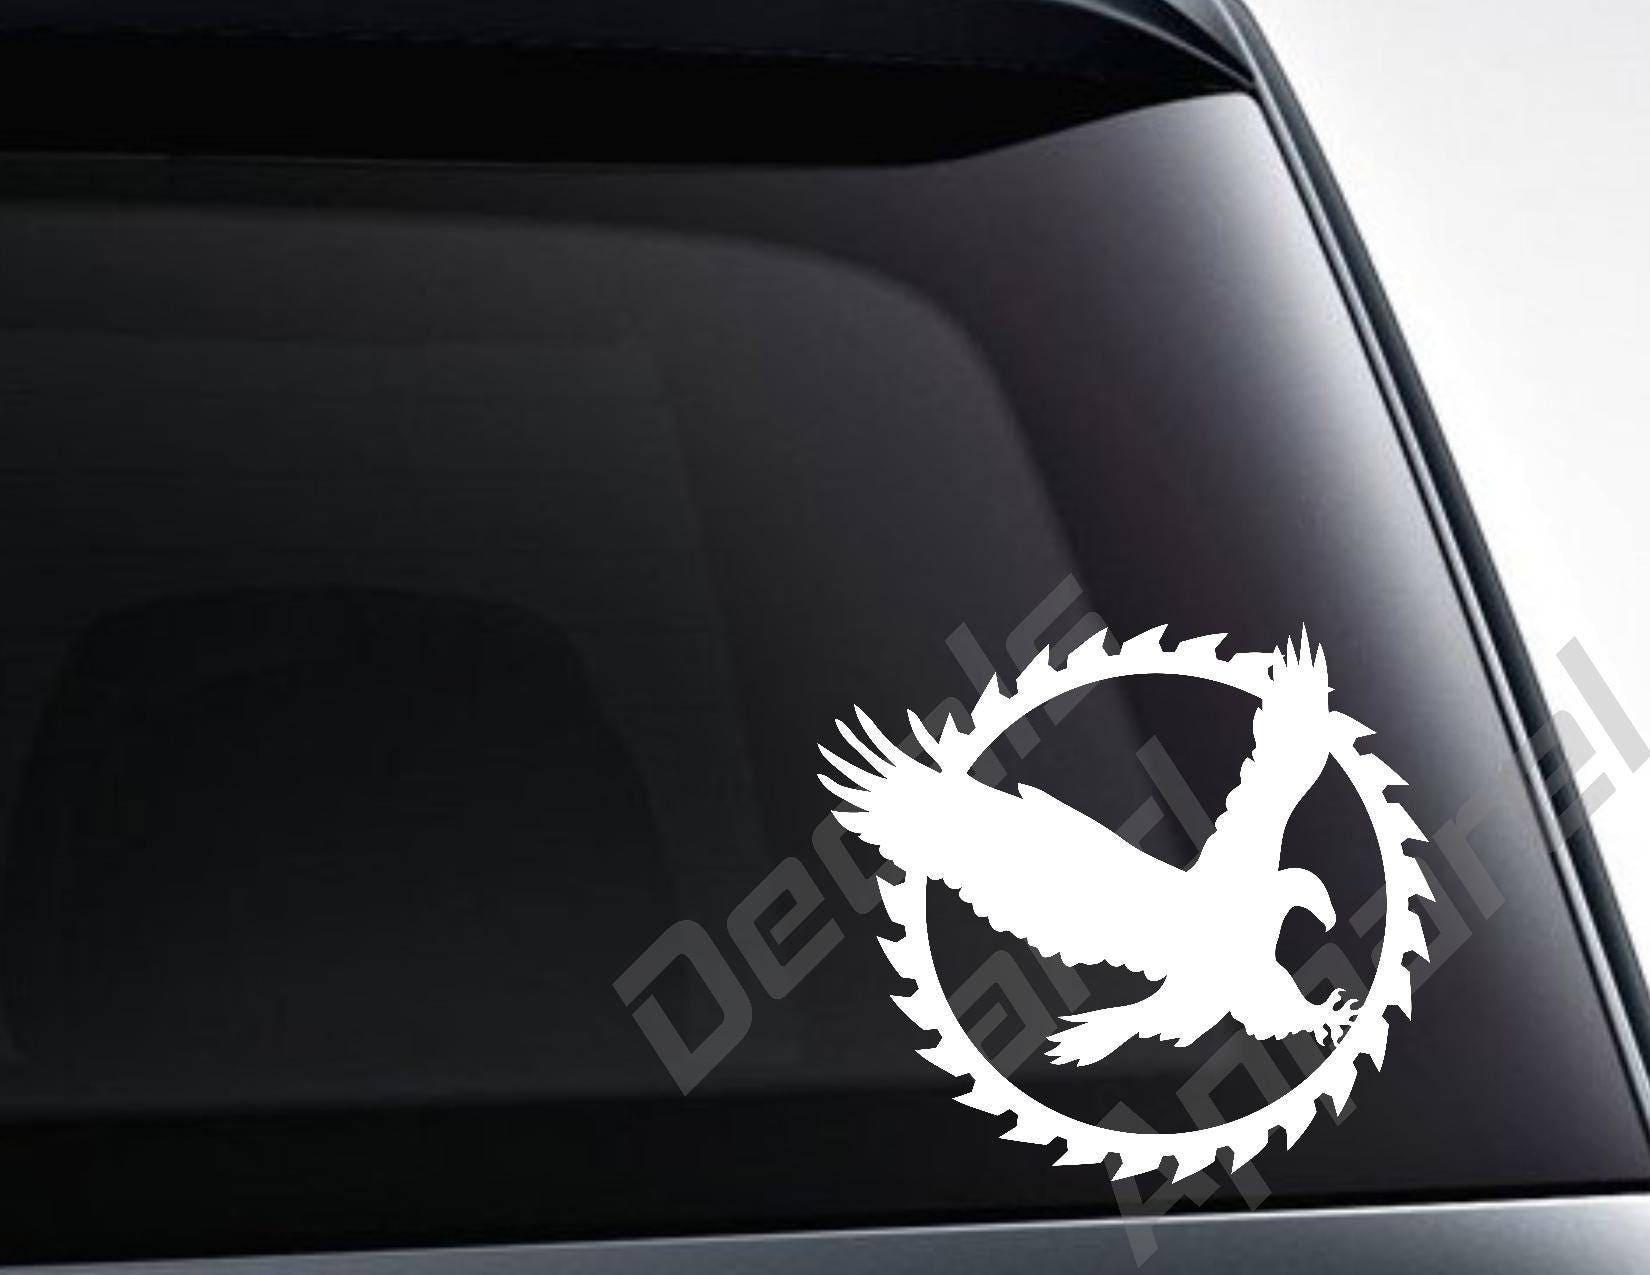 Yin Yang Skulls Sticker for Car Truck Laptop Toolbox Wall Tumbler Window Decal